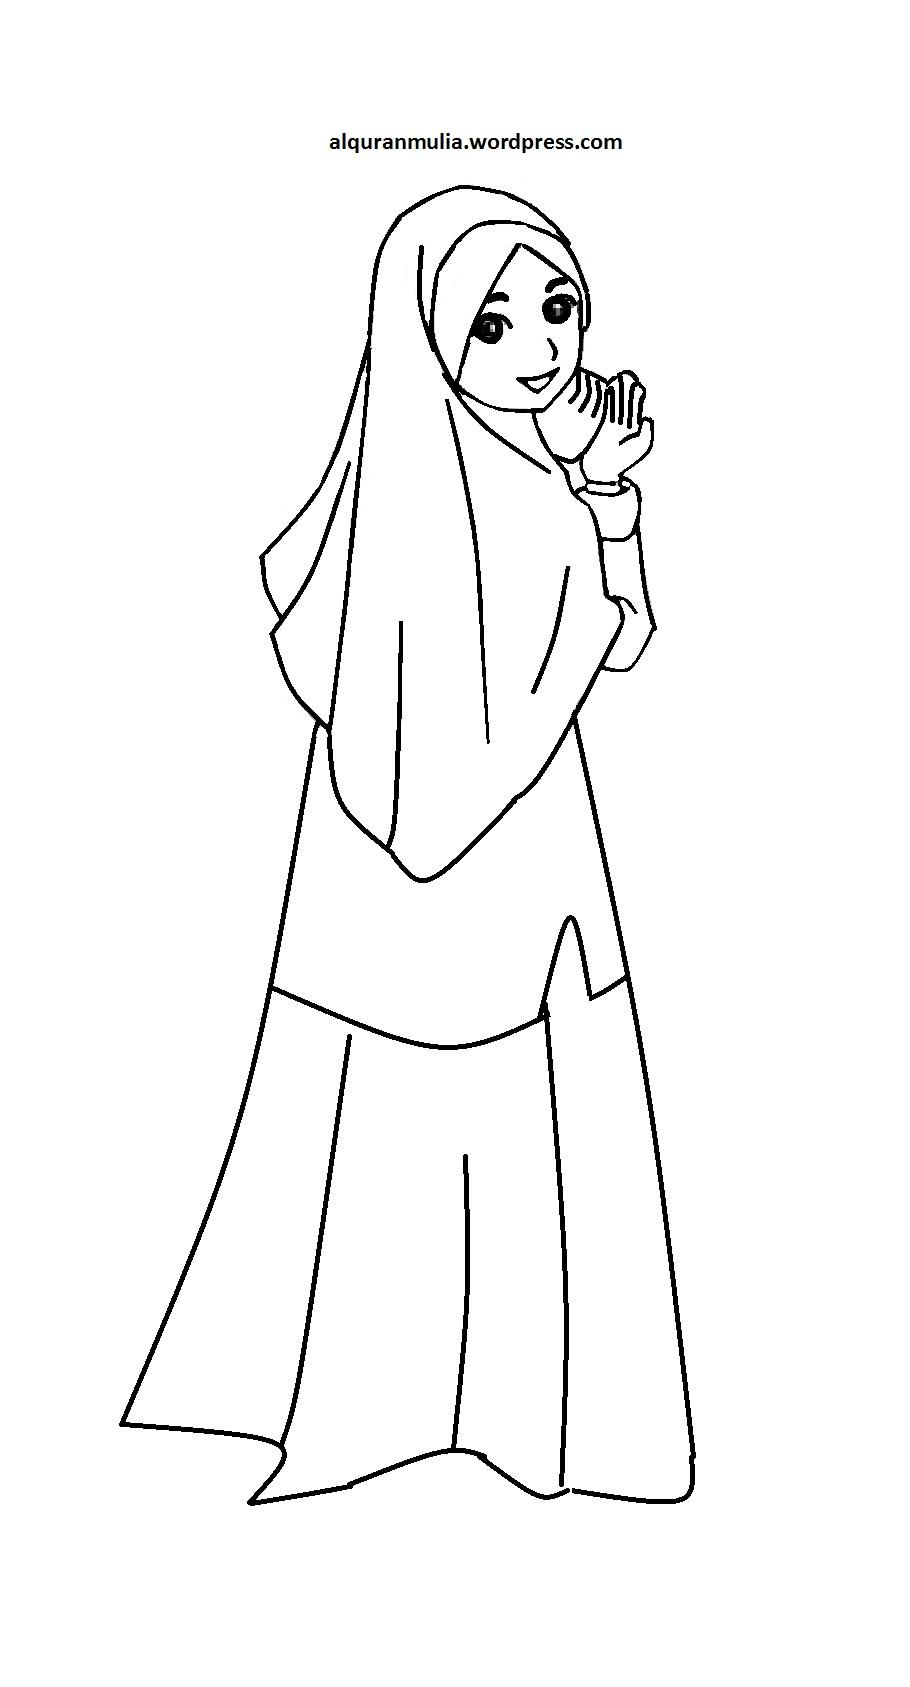 Sketsa Gambar Wanita Muslimah